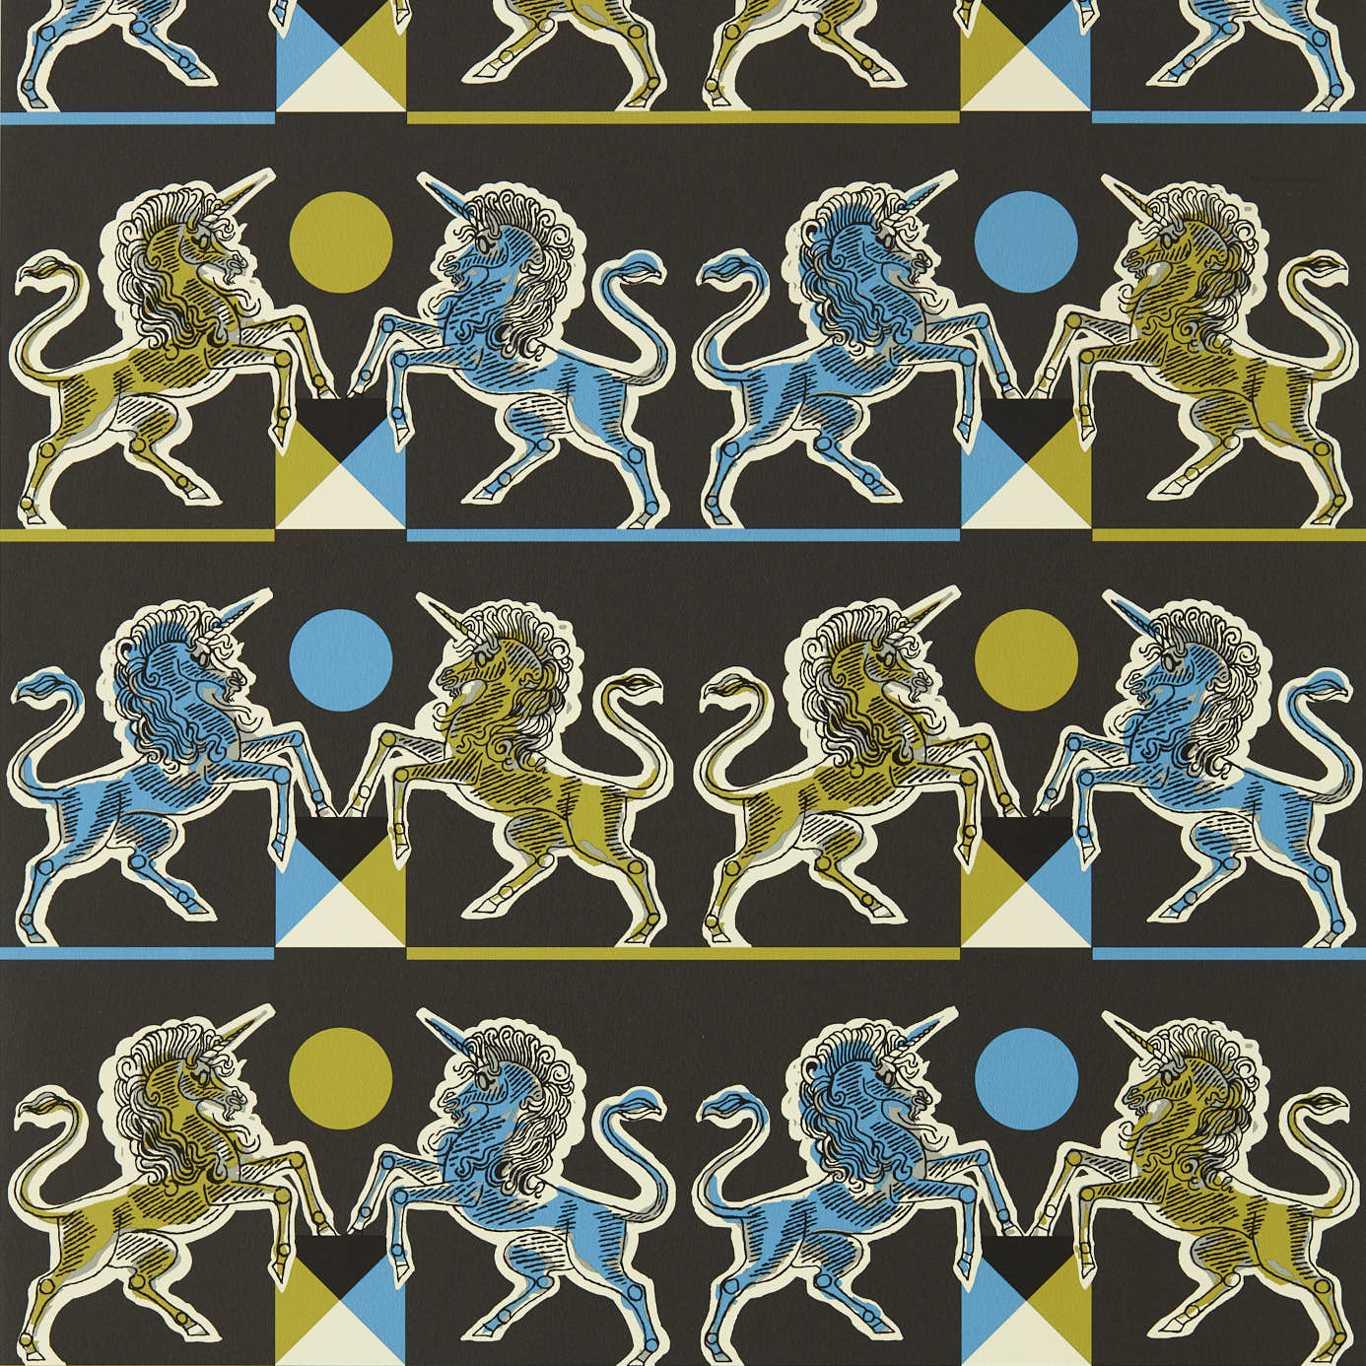 Elixir of Life Wallpaper by ARC